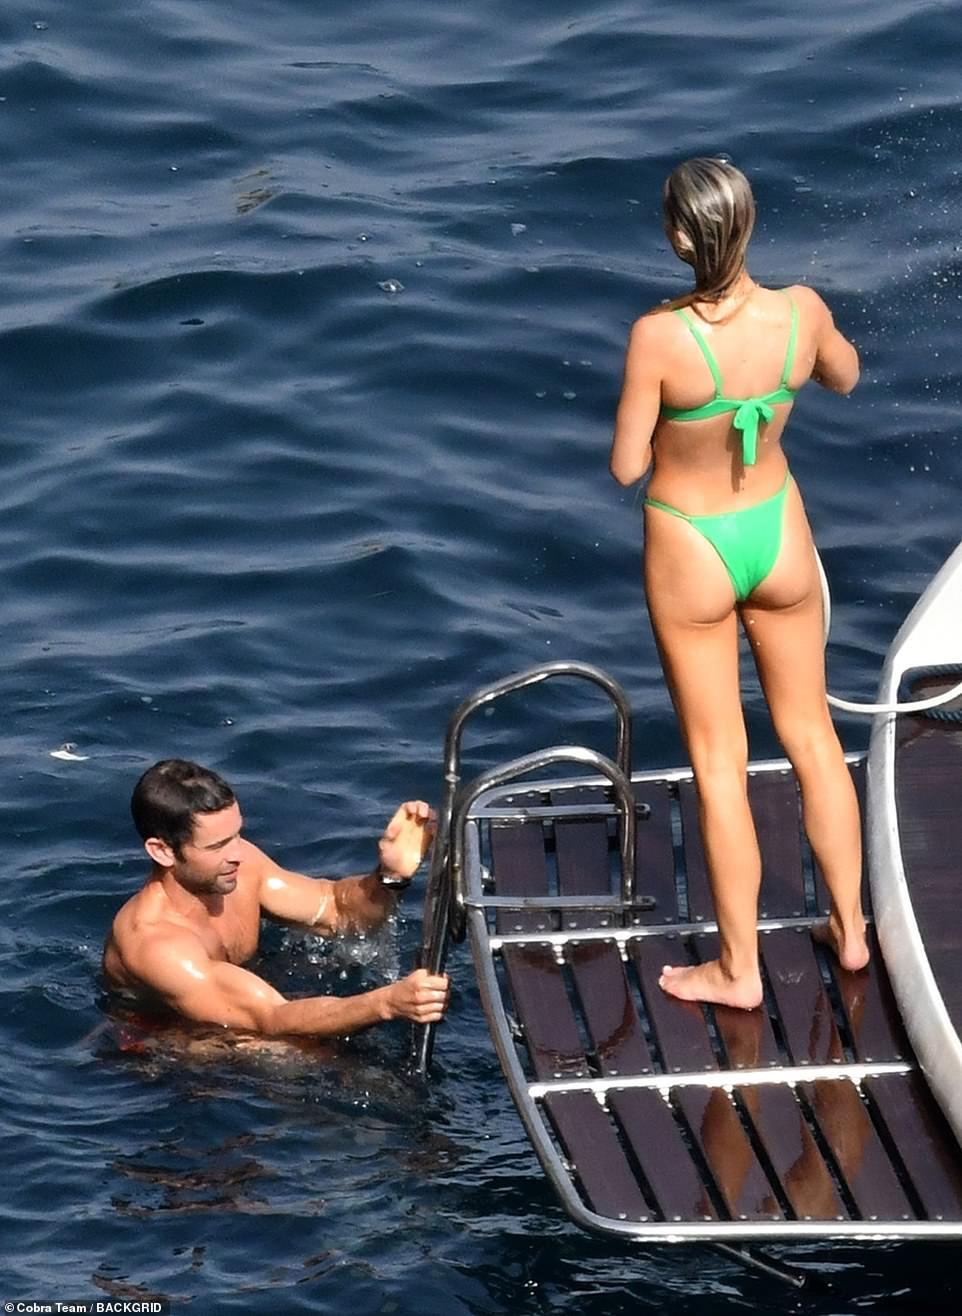 All at sea: The pair were thoroughly enjoying their outing amid their trip to Capri